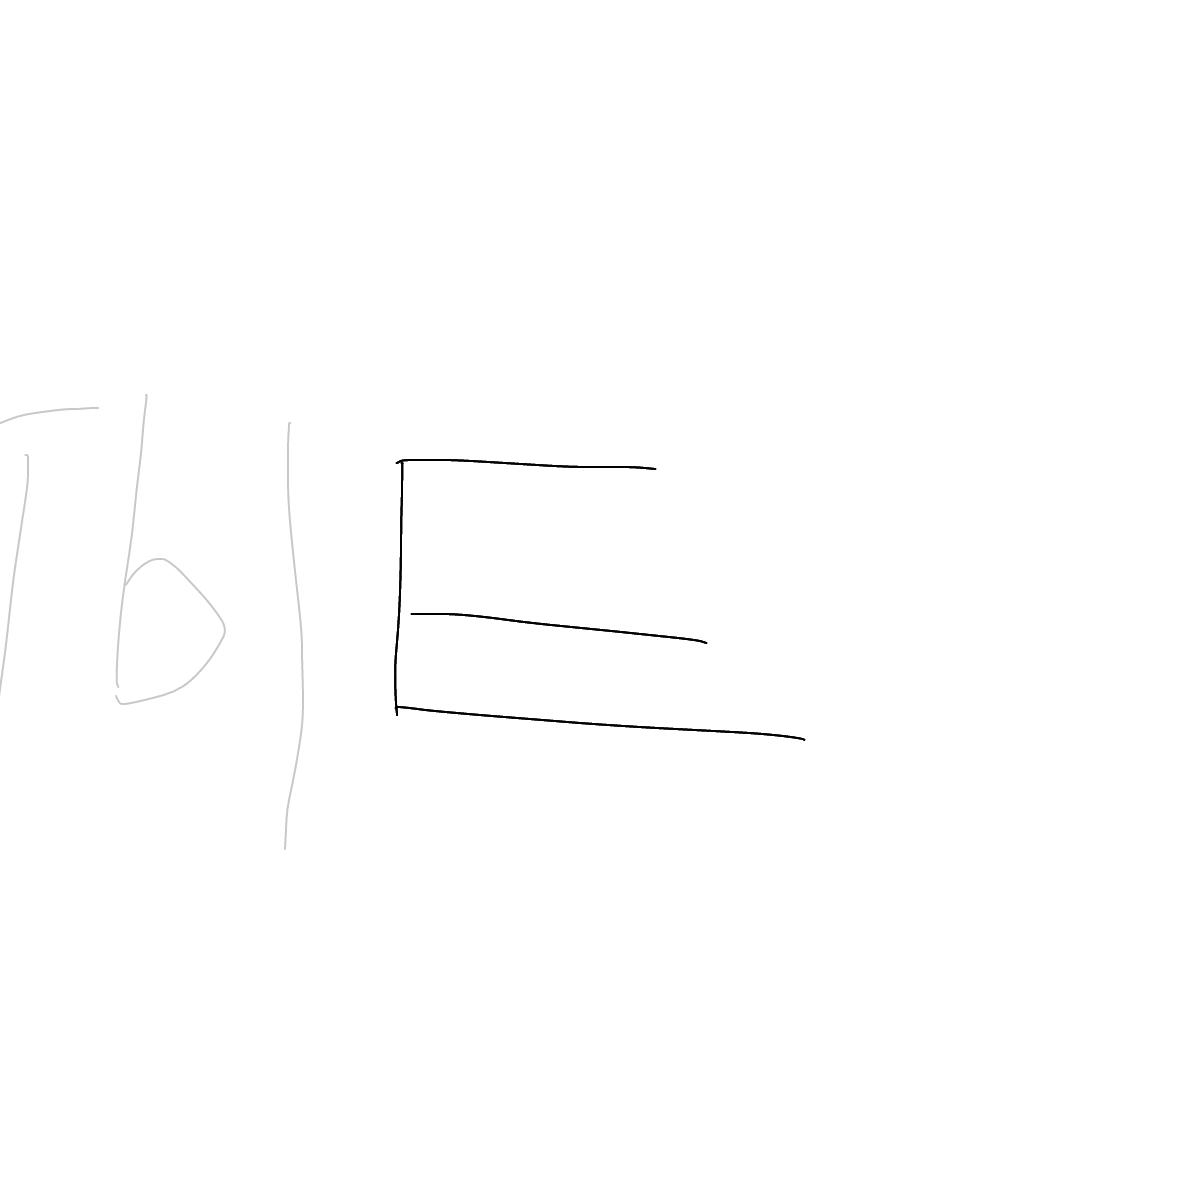 BAAAM drawing#21058 lat:55.7520942687988300lng: 37.6201934814453100